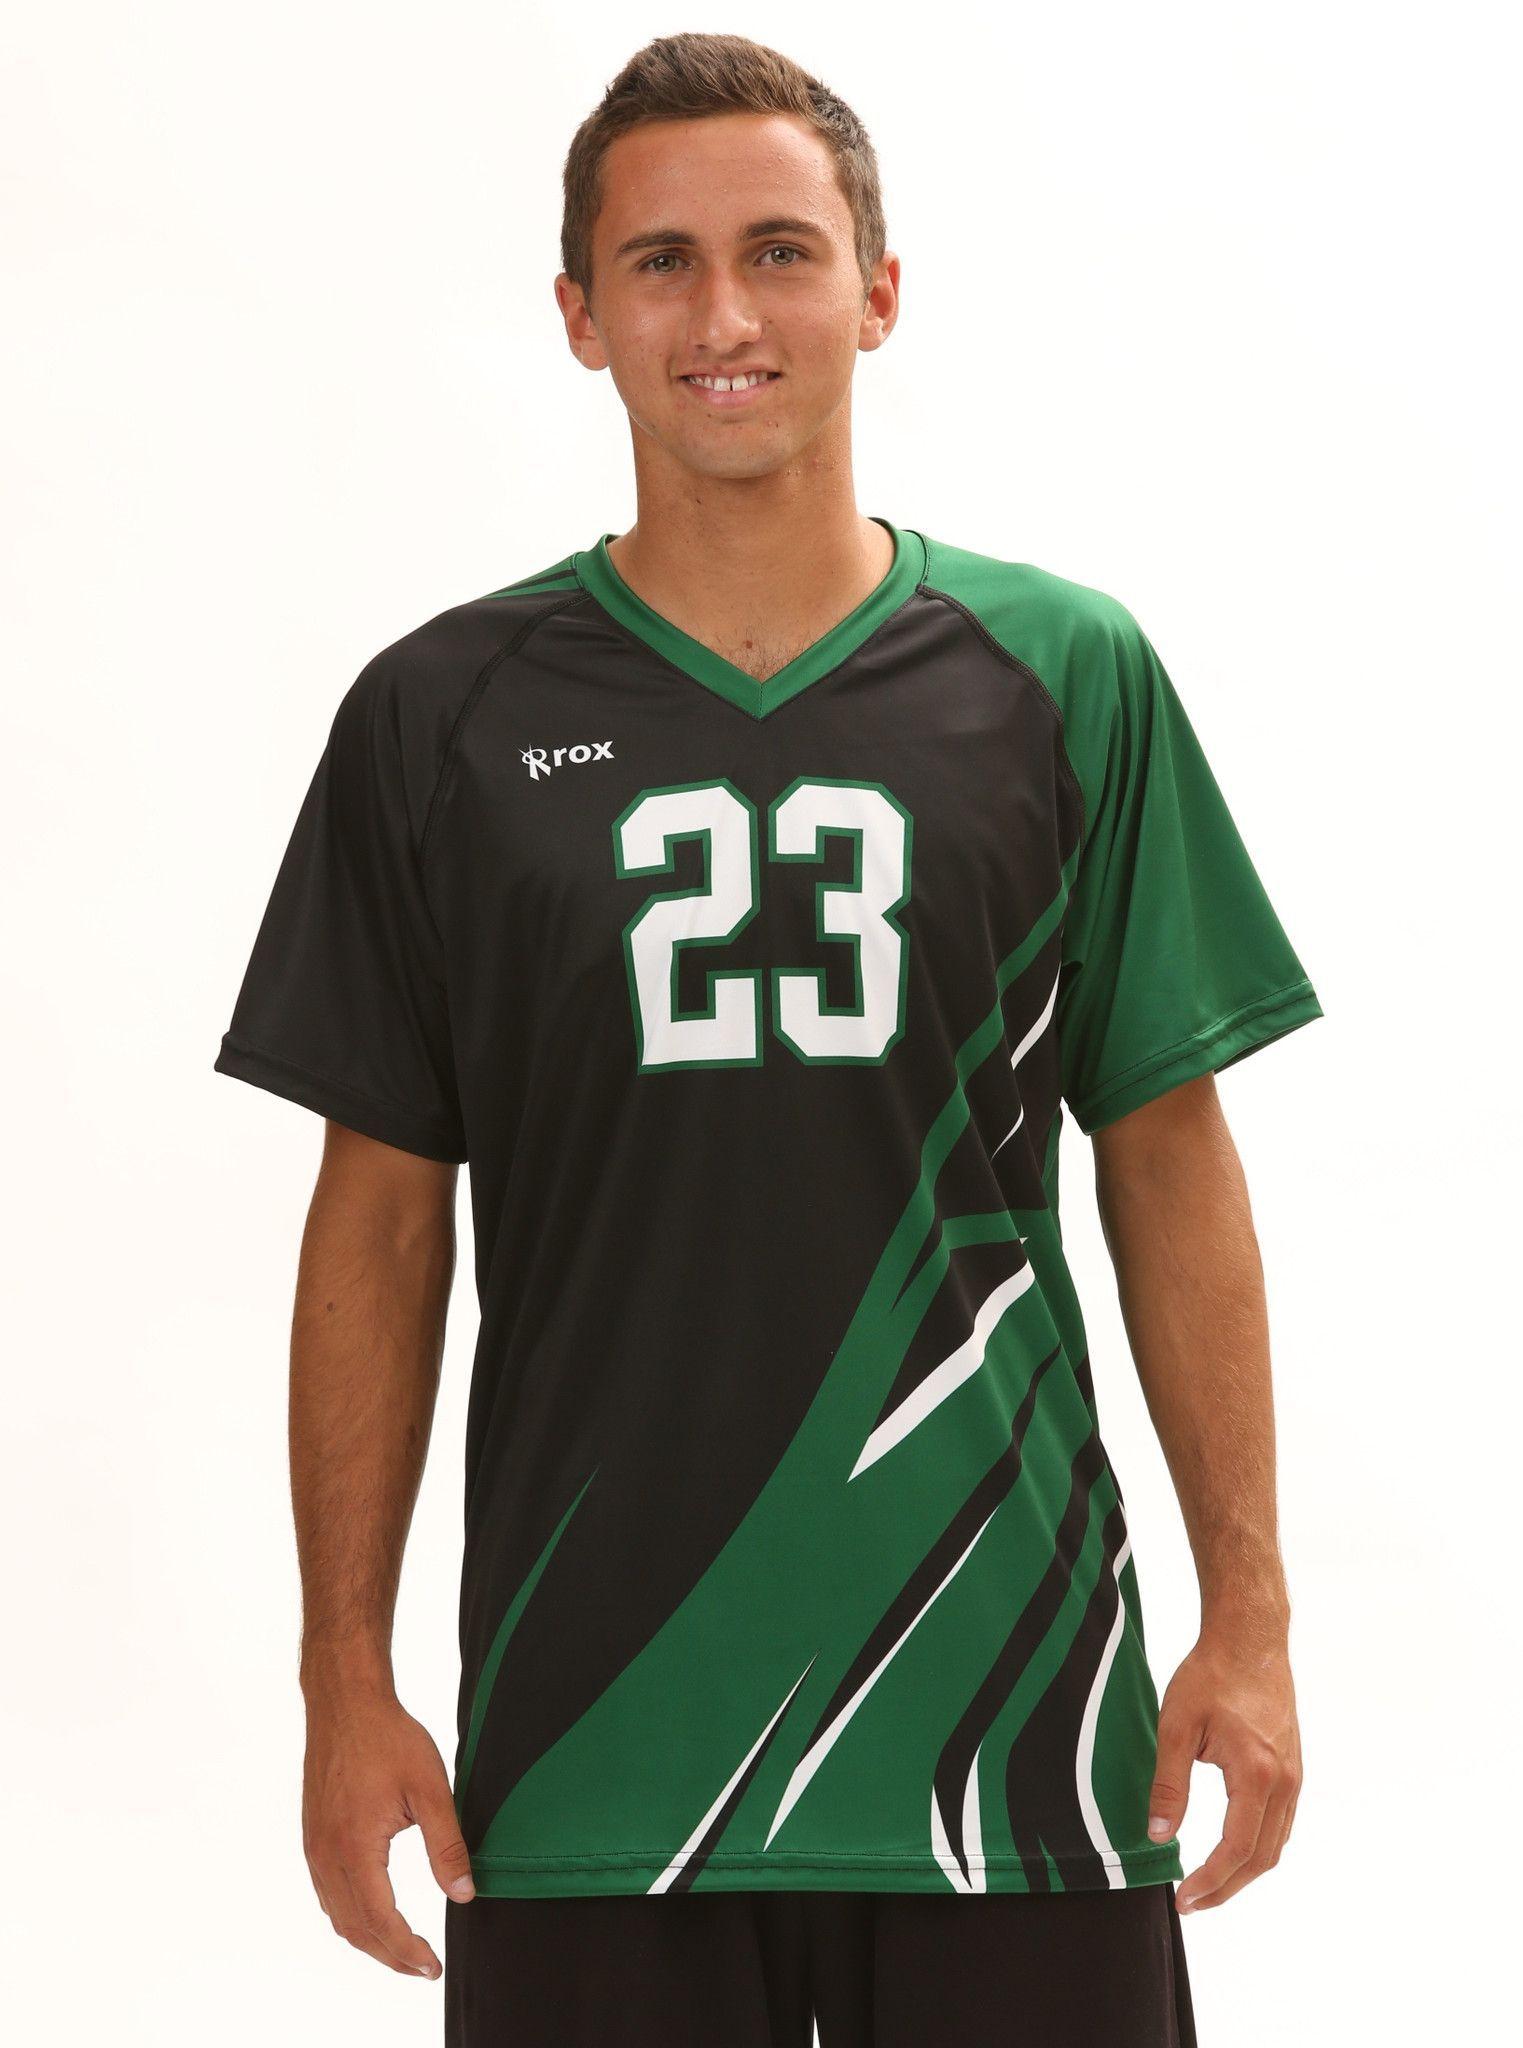 Rox Volleyball Quake Men S Sublimated Uniform Volleyball Uniforms Design Volleyball Uniforms Men In Uniform